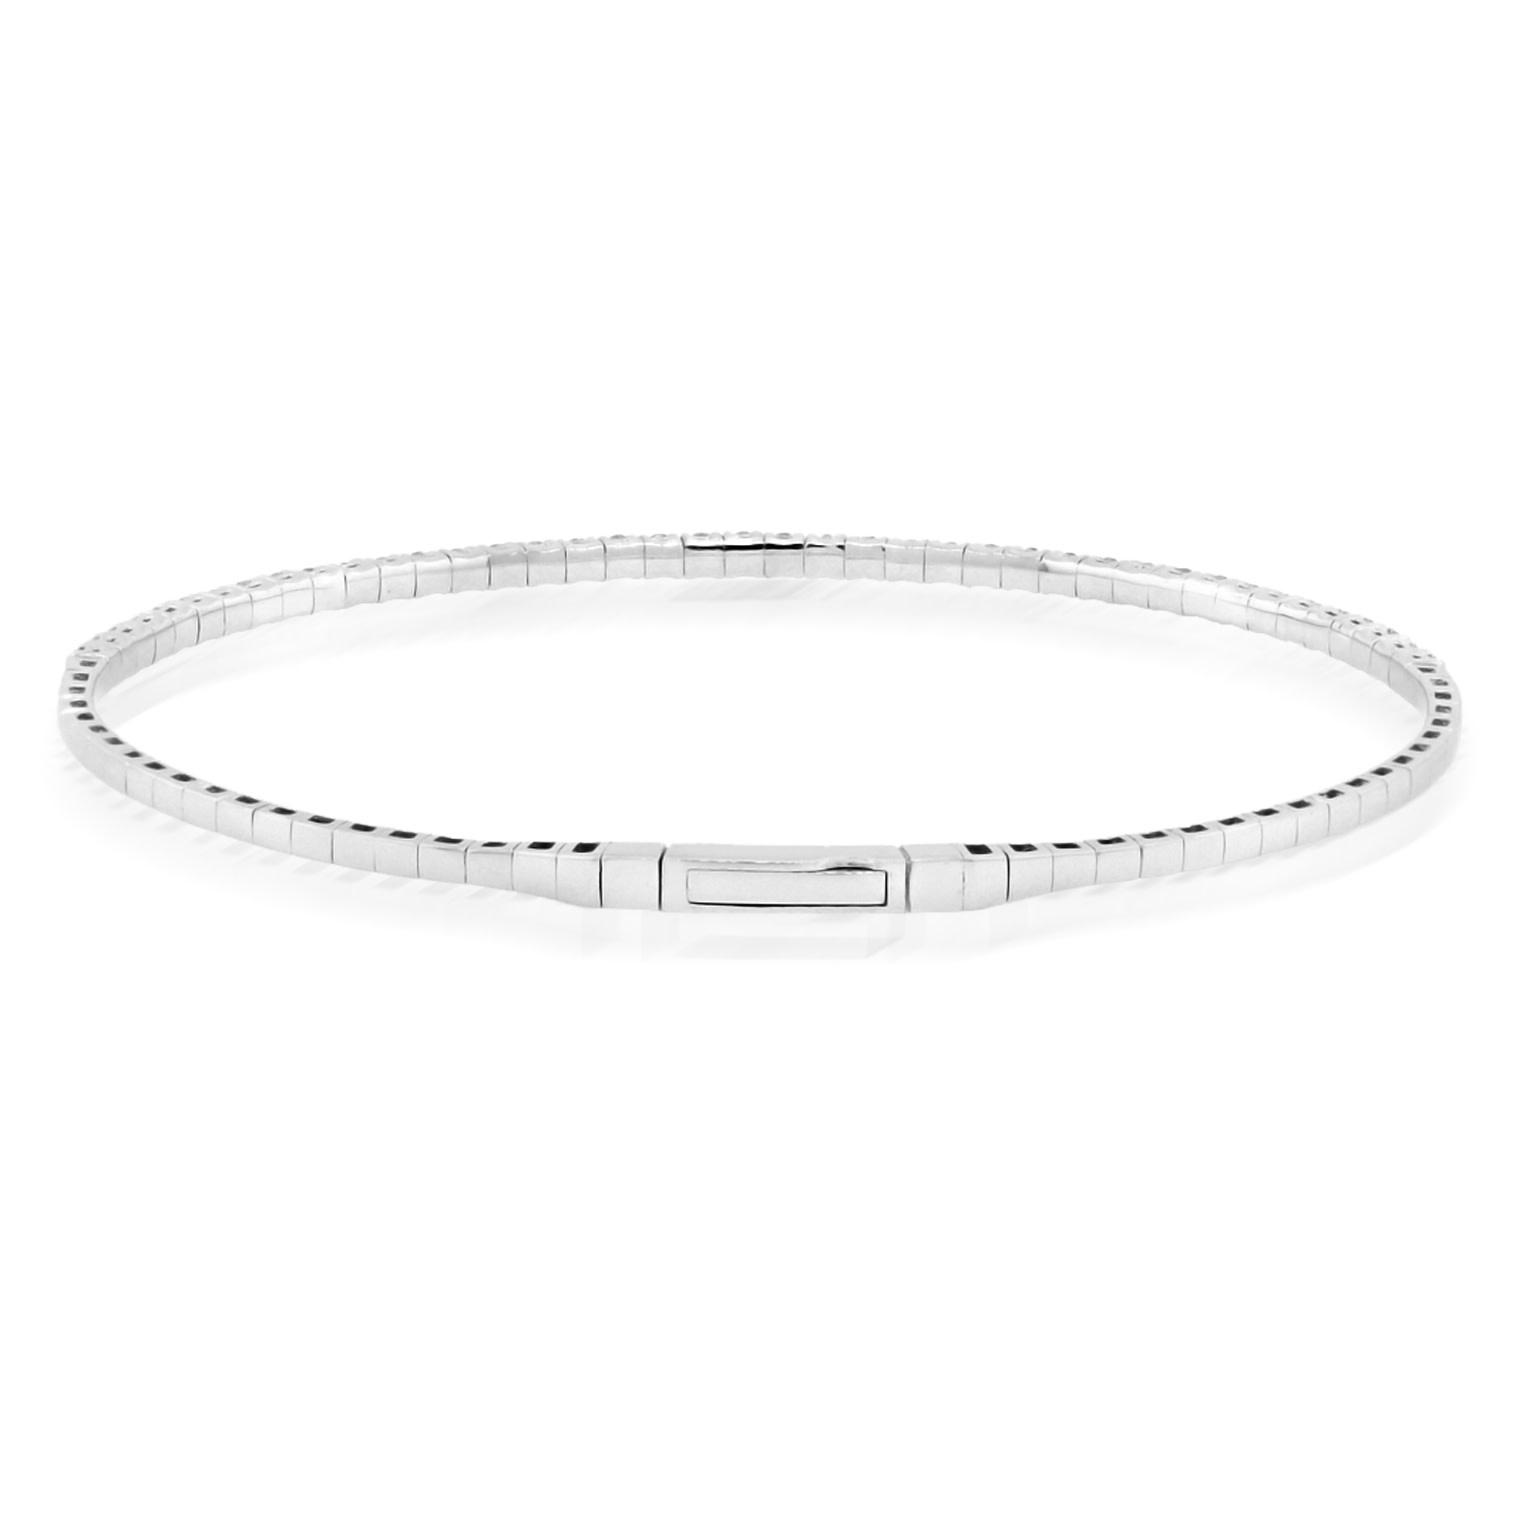 Trabert Goldsmiths 1.02ct White Gold Diamond Flex Bracelet